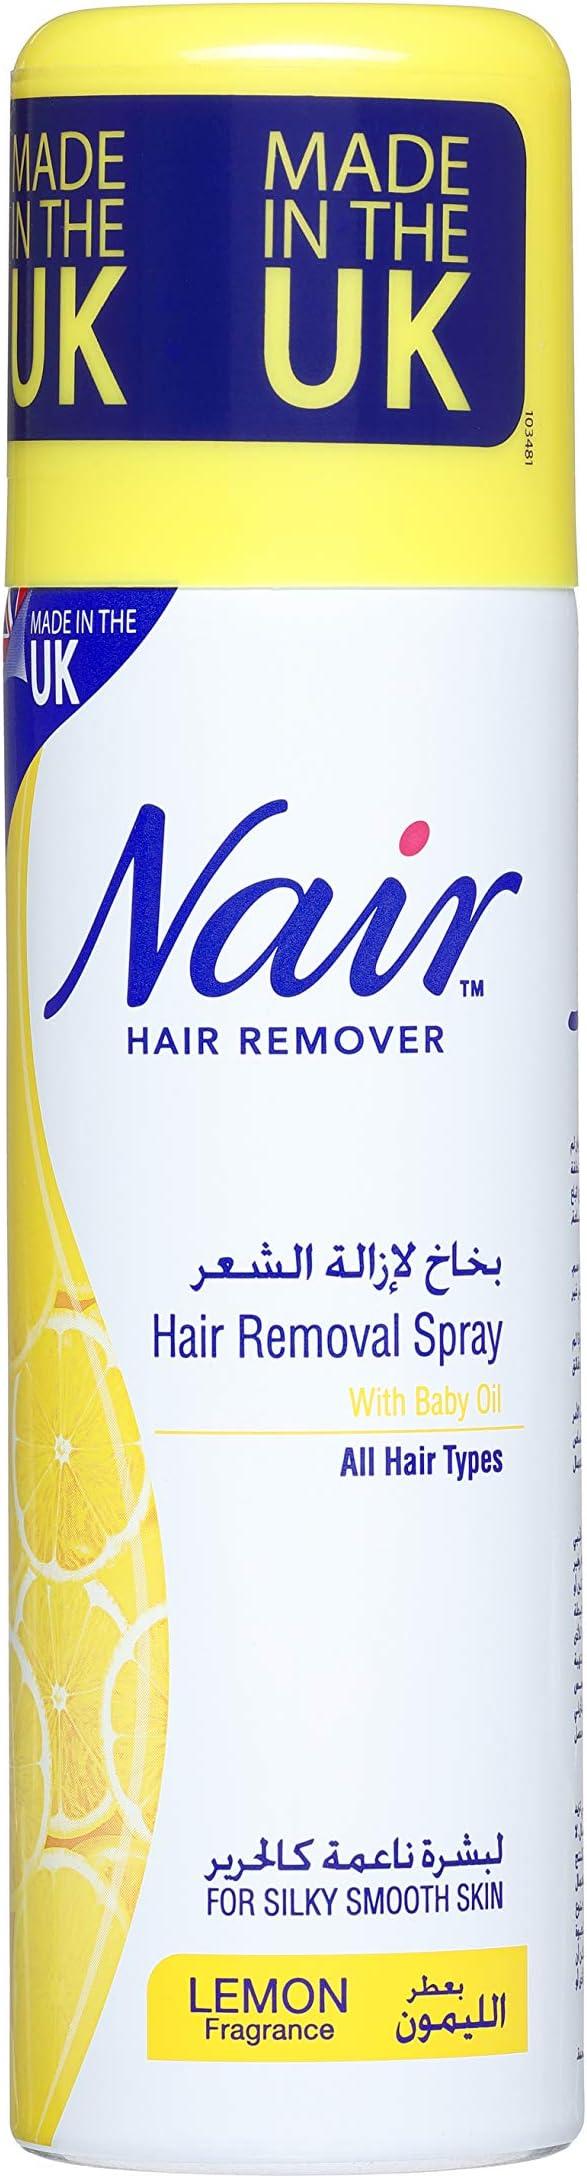 Nair Hair Remover Spray Lemon Fragrance 200 Ml Price In Uae